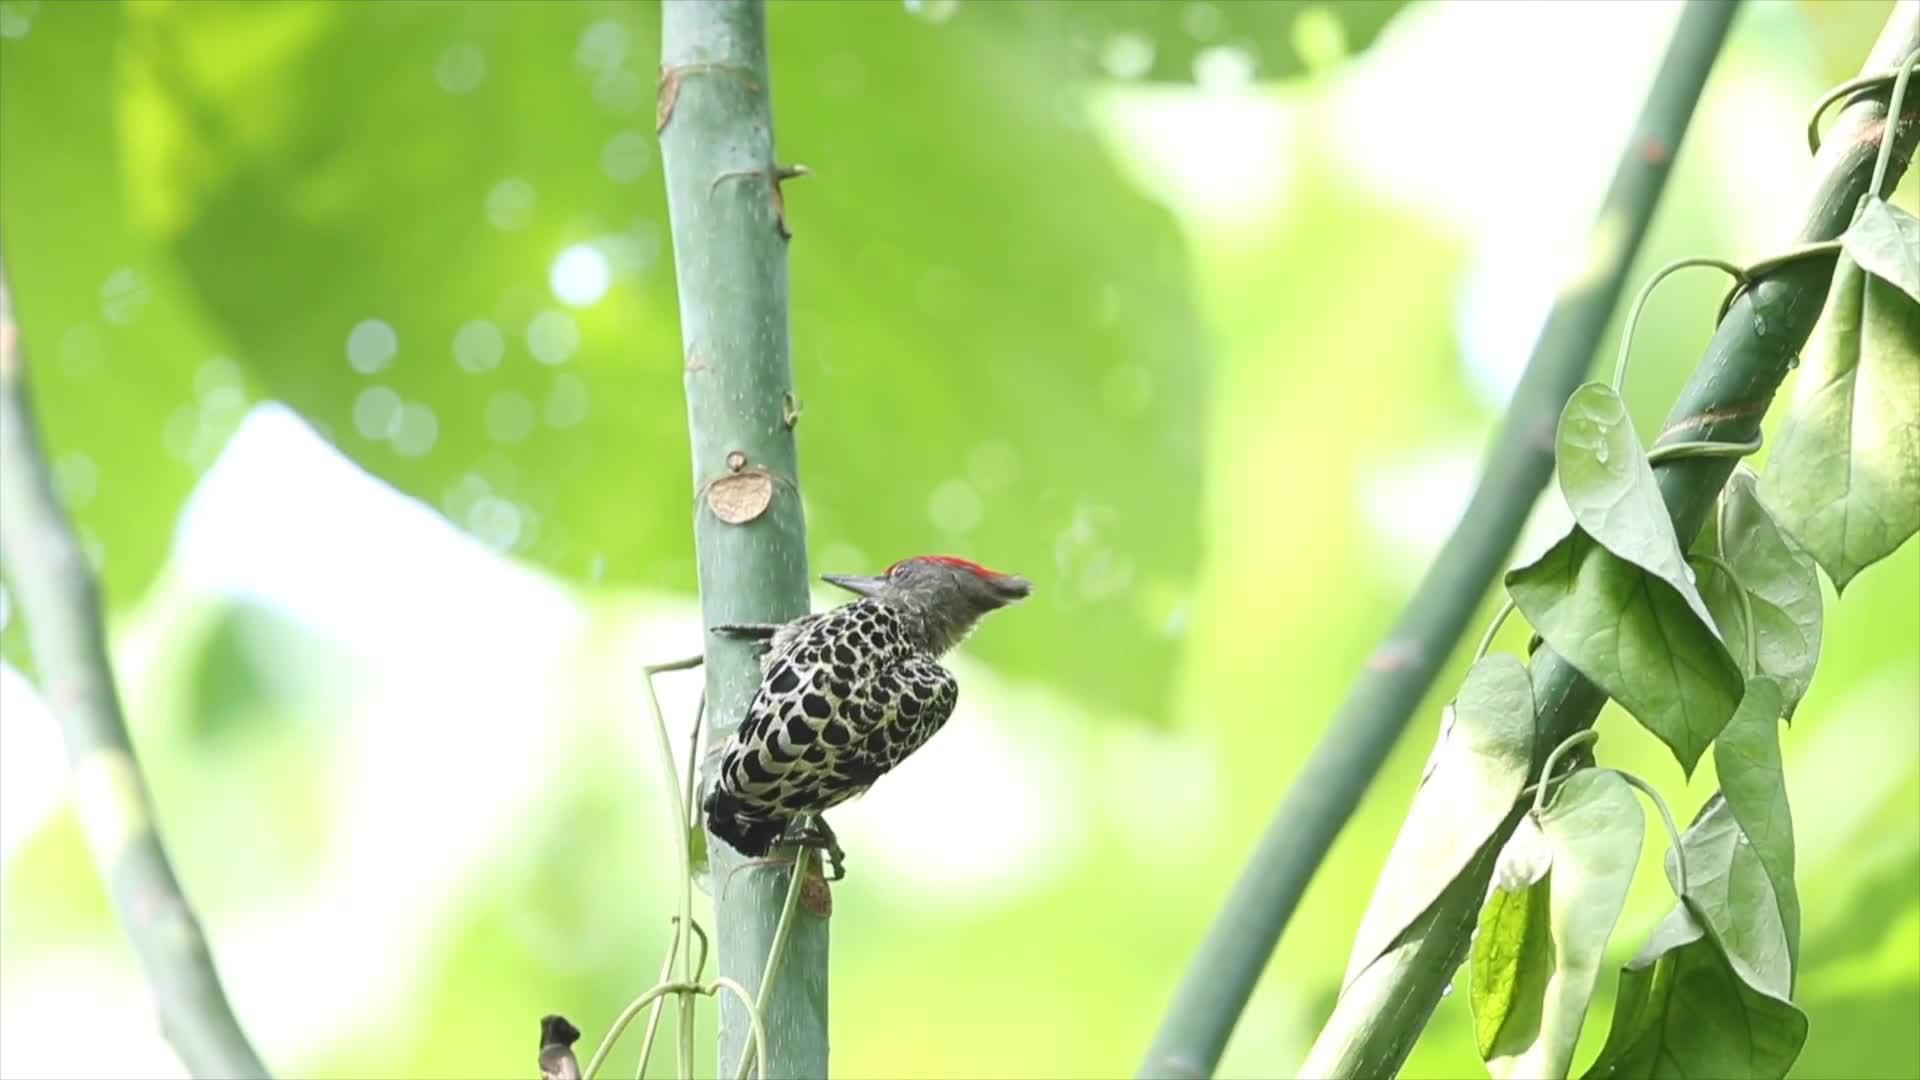 grey-and-buff woodpecker GIFs